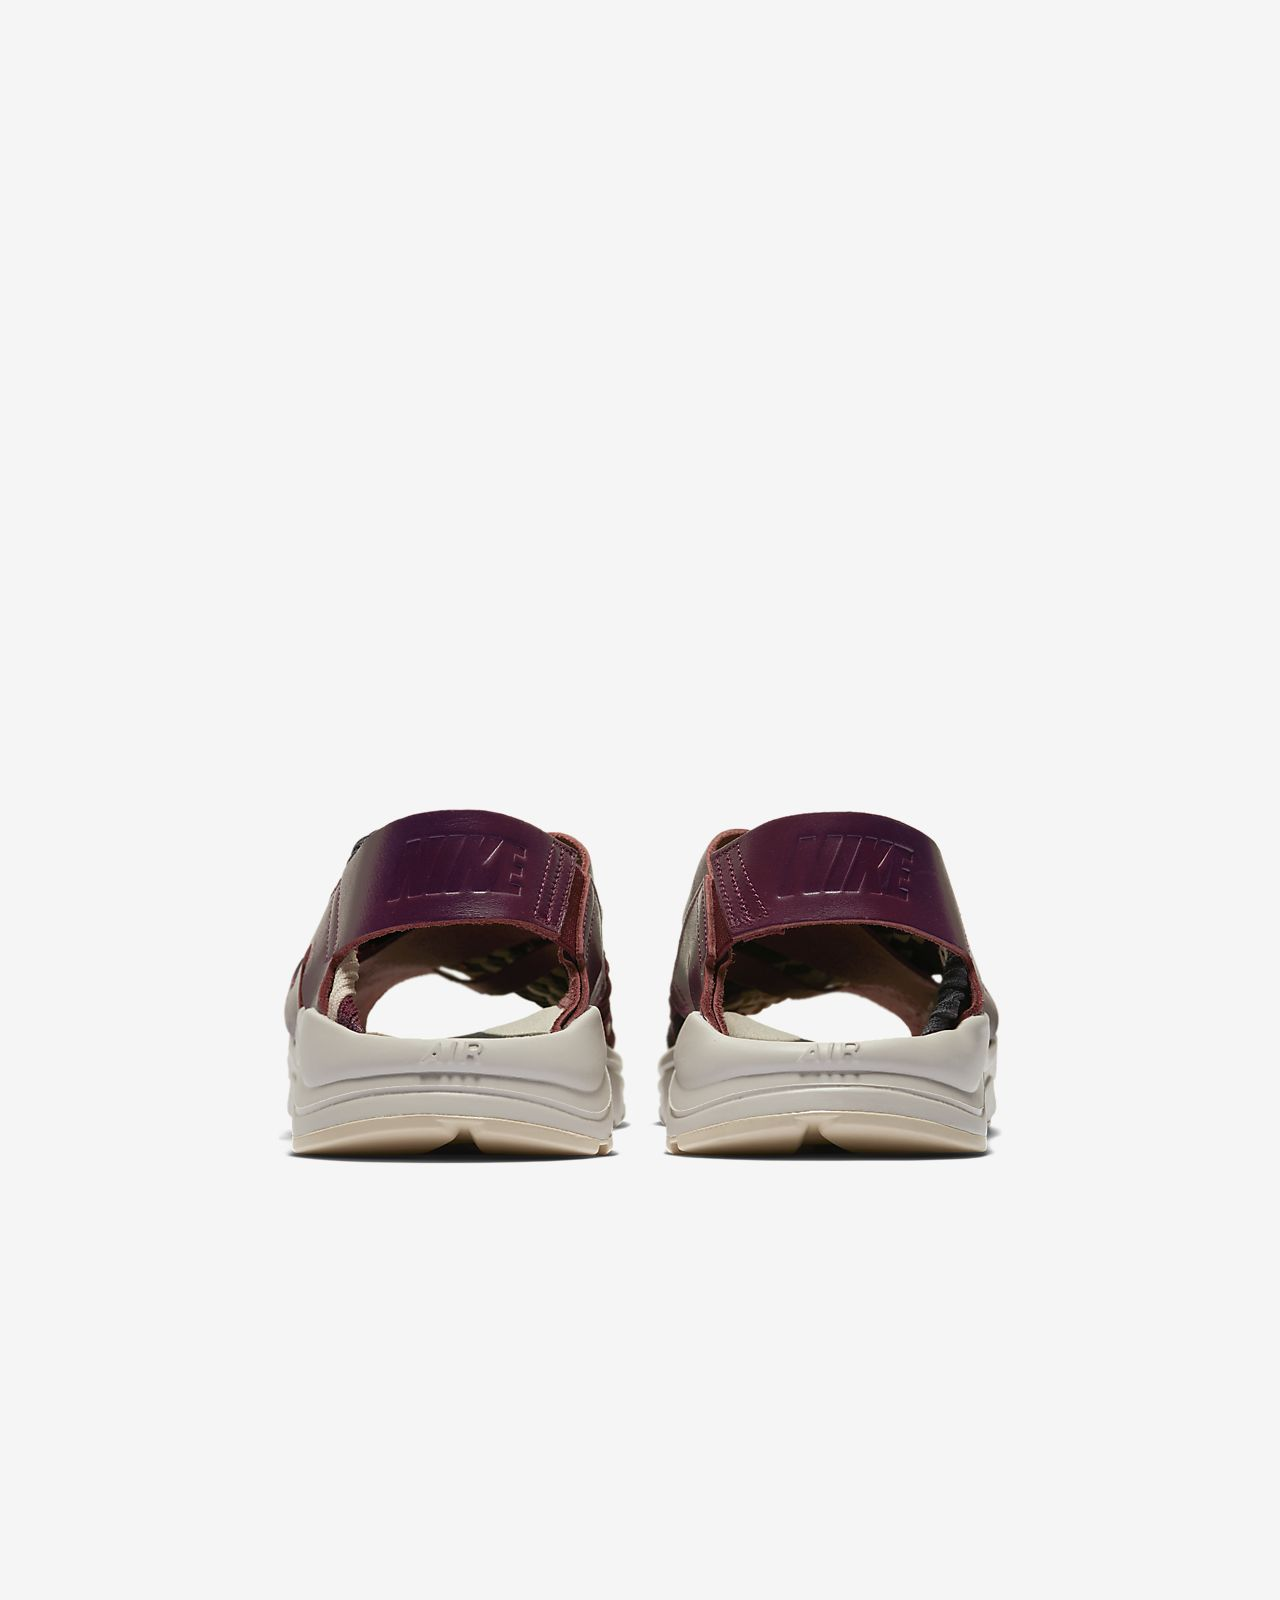 91e361aafd1e Nike Air Huarache Ultra Women s Sandal. Nike.com BE